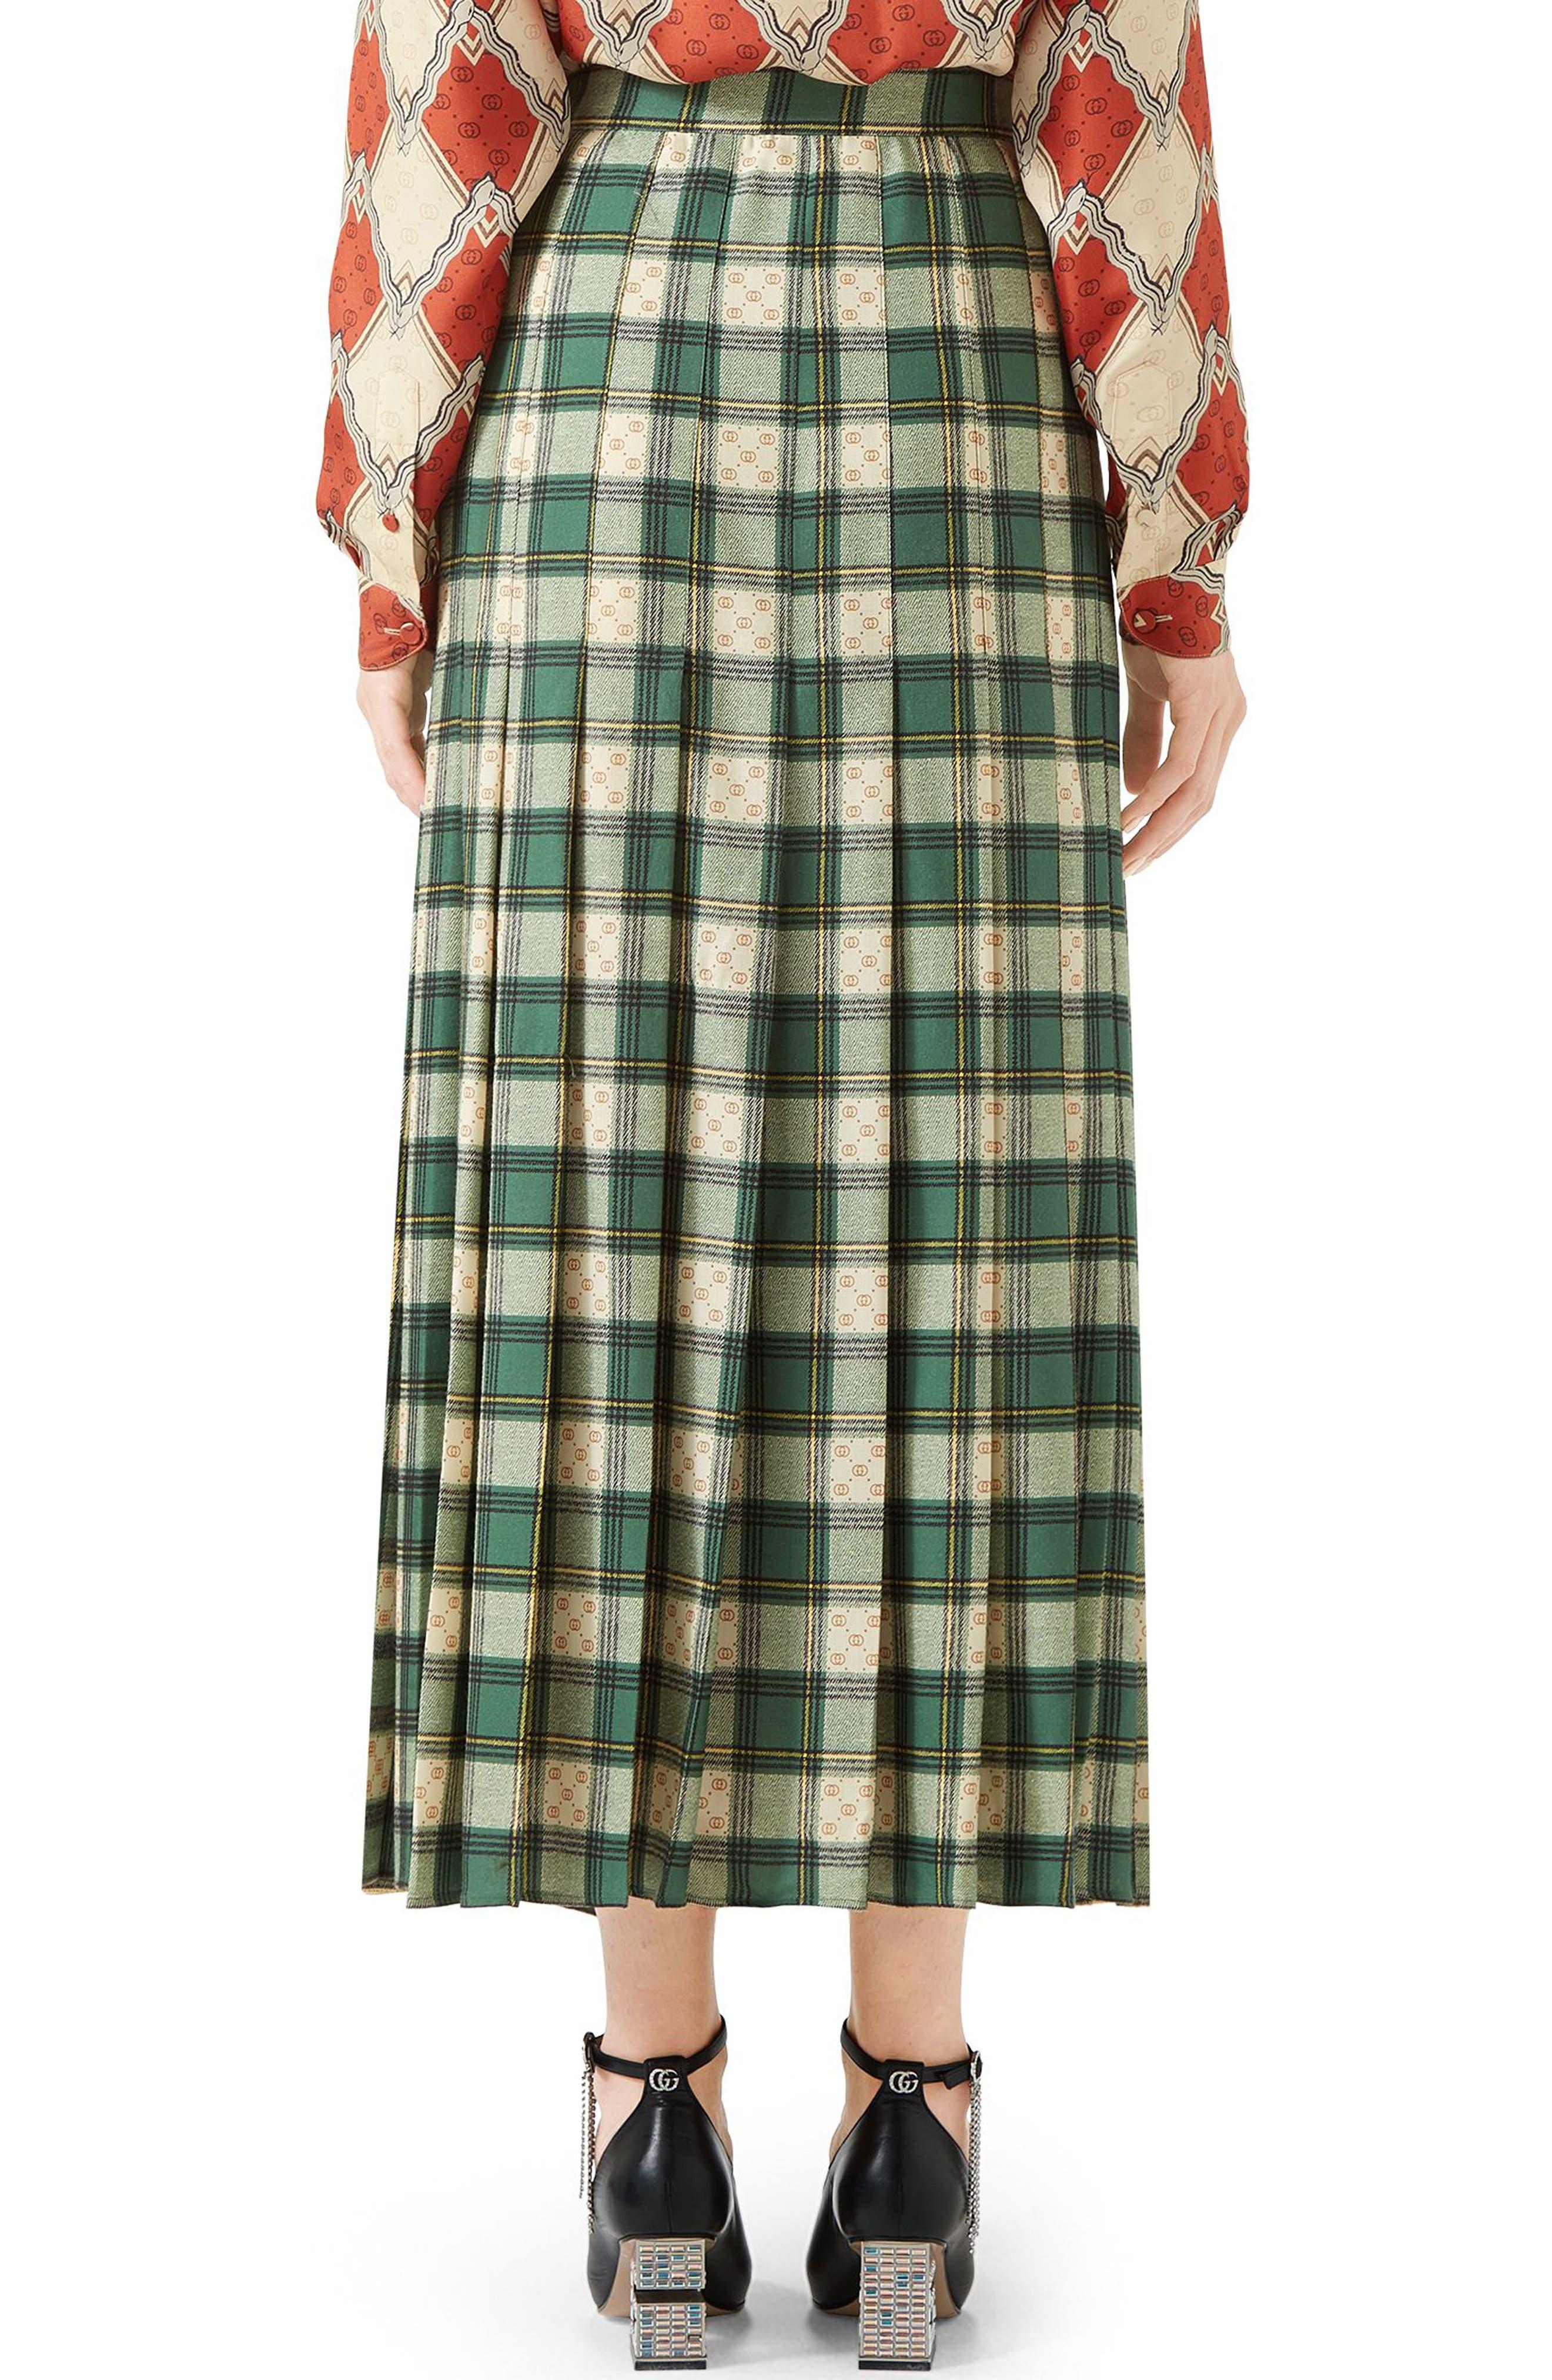 Tartan Check Wool Twill Maxi Skirt,                             Alternate thumbnail 2, color,                             3741 GREEN/ ROSE BEIGE PRI